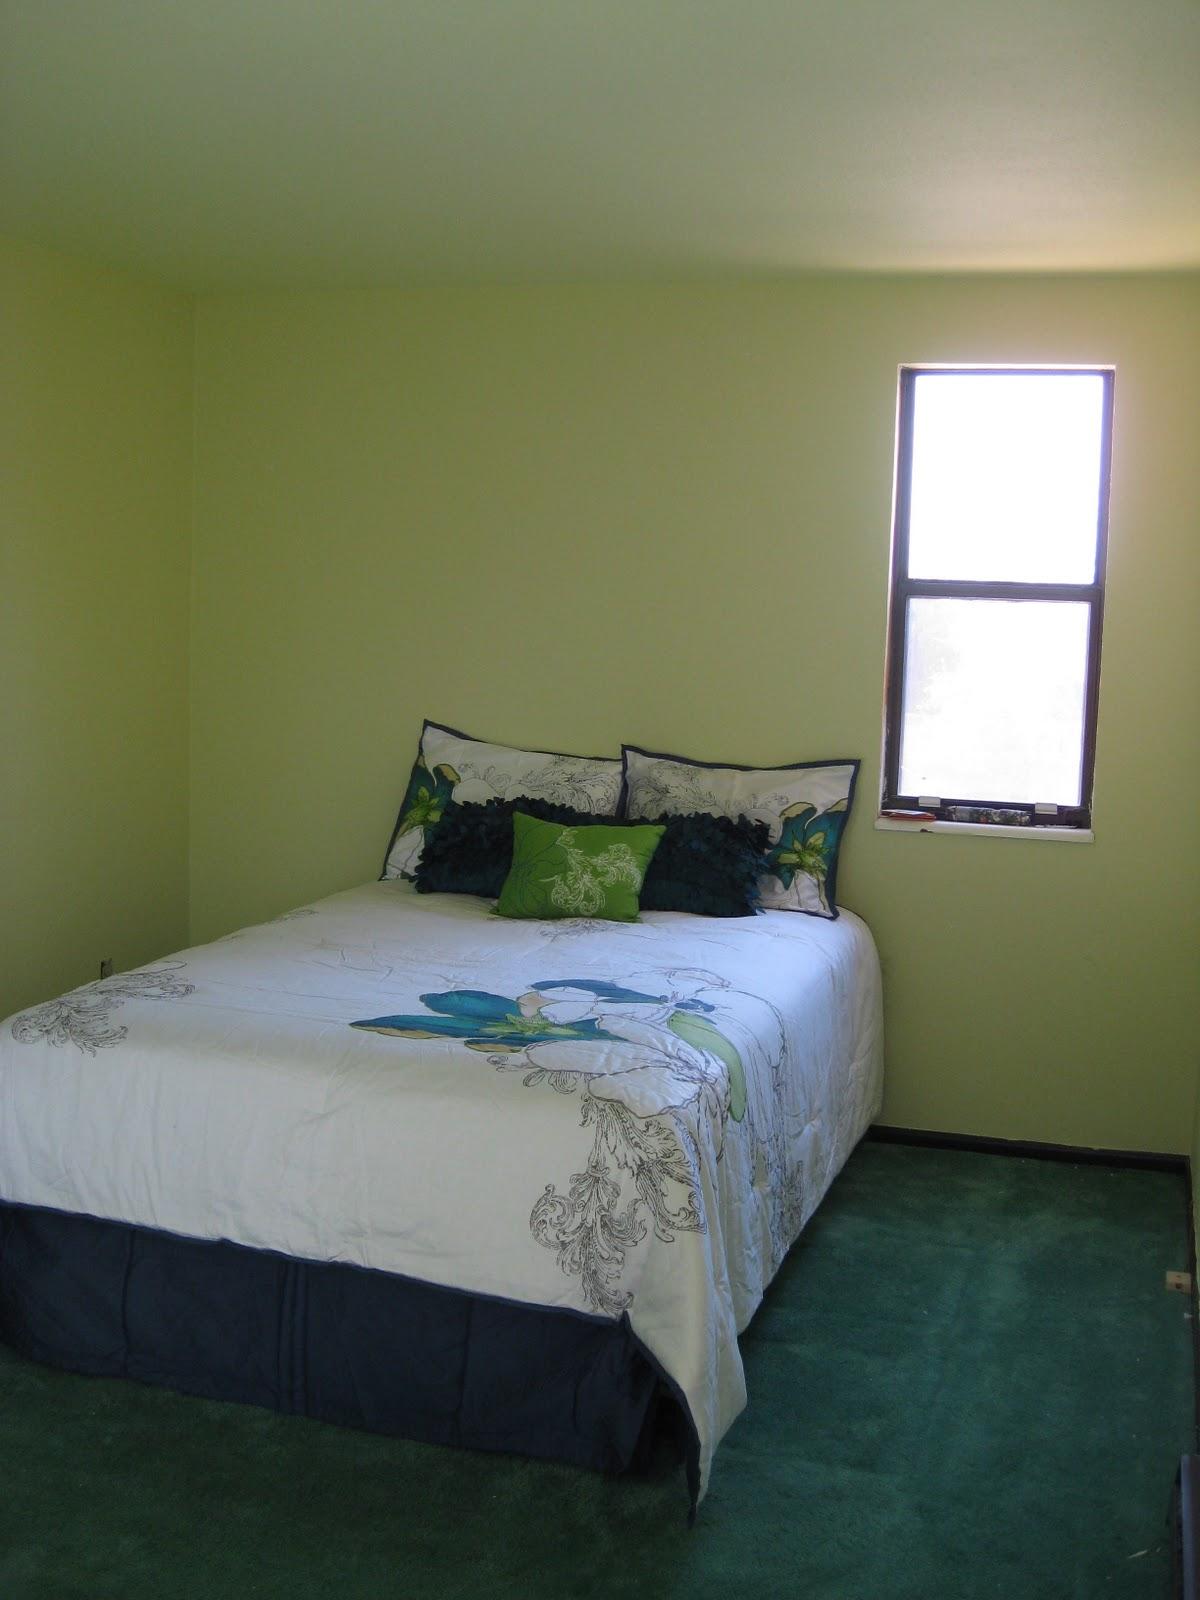 Roomscapes Decorative Arts Painting Progress